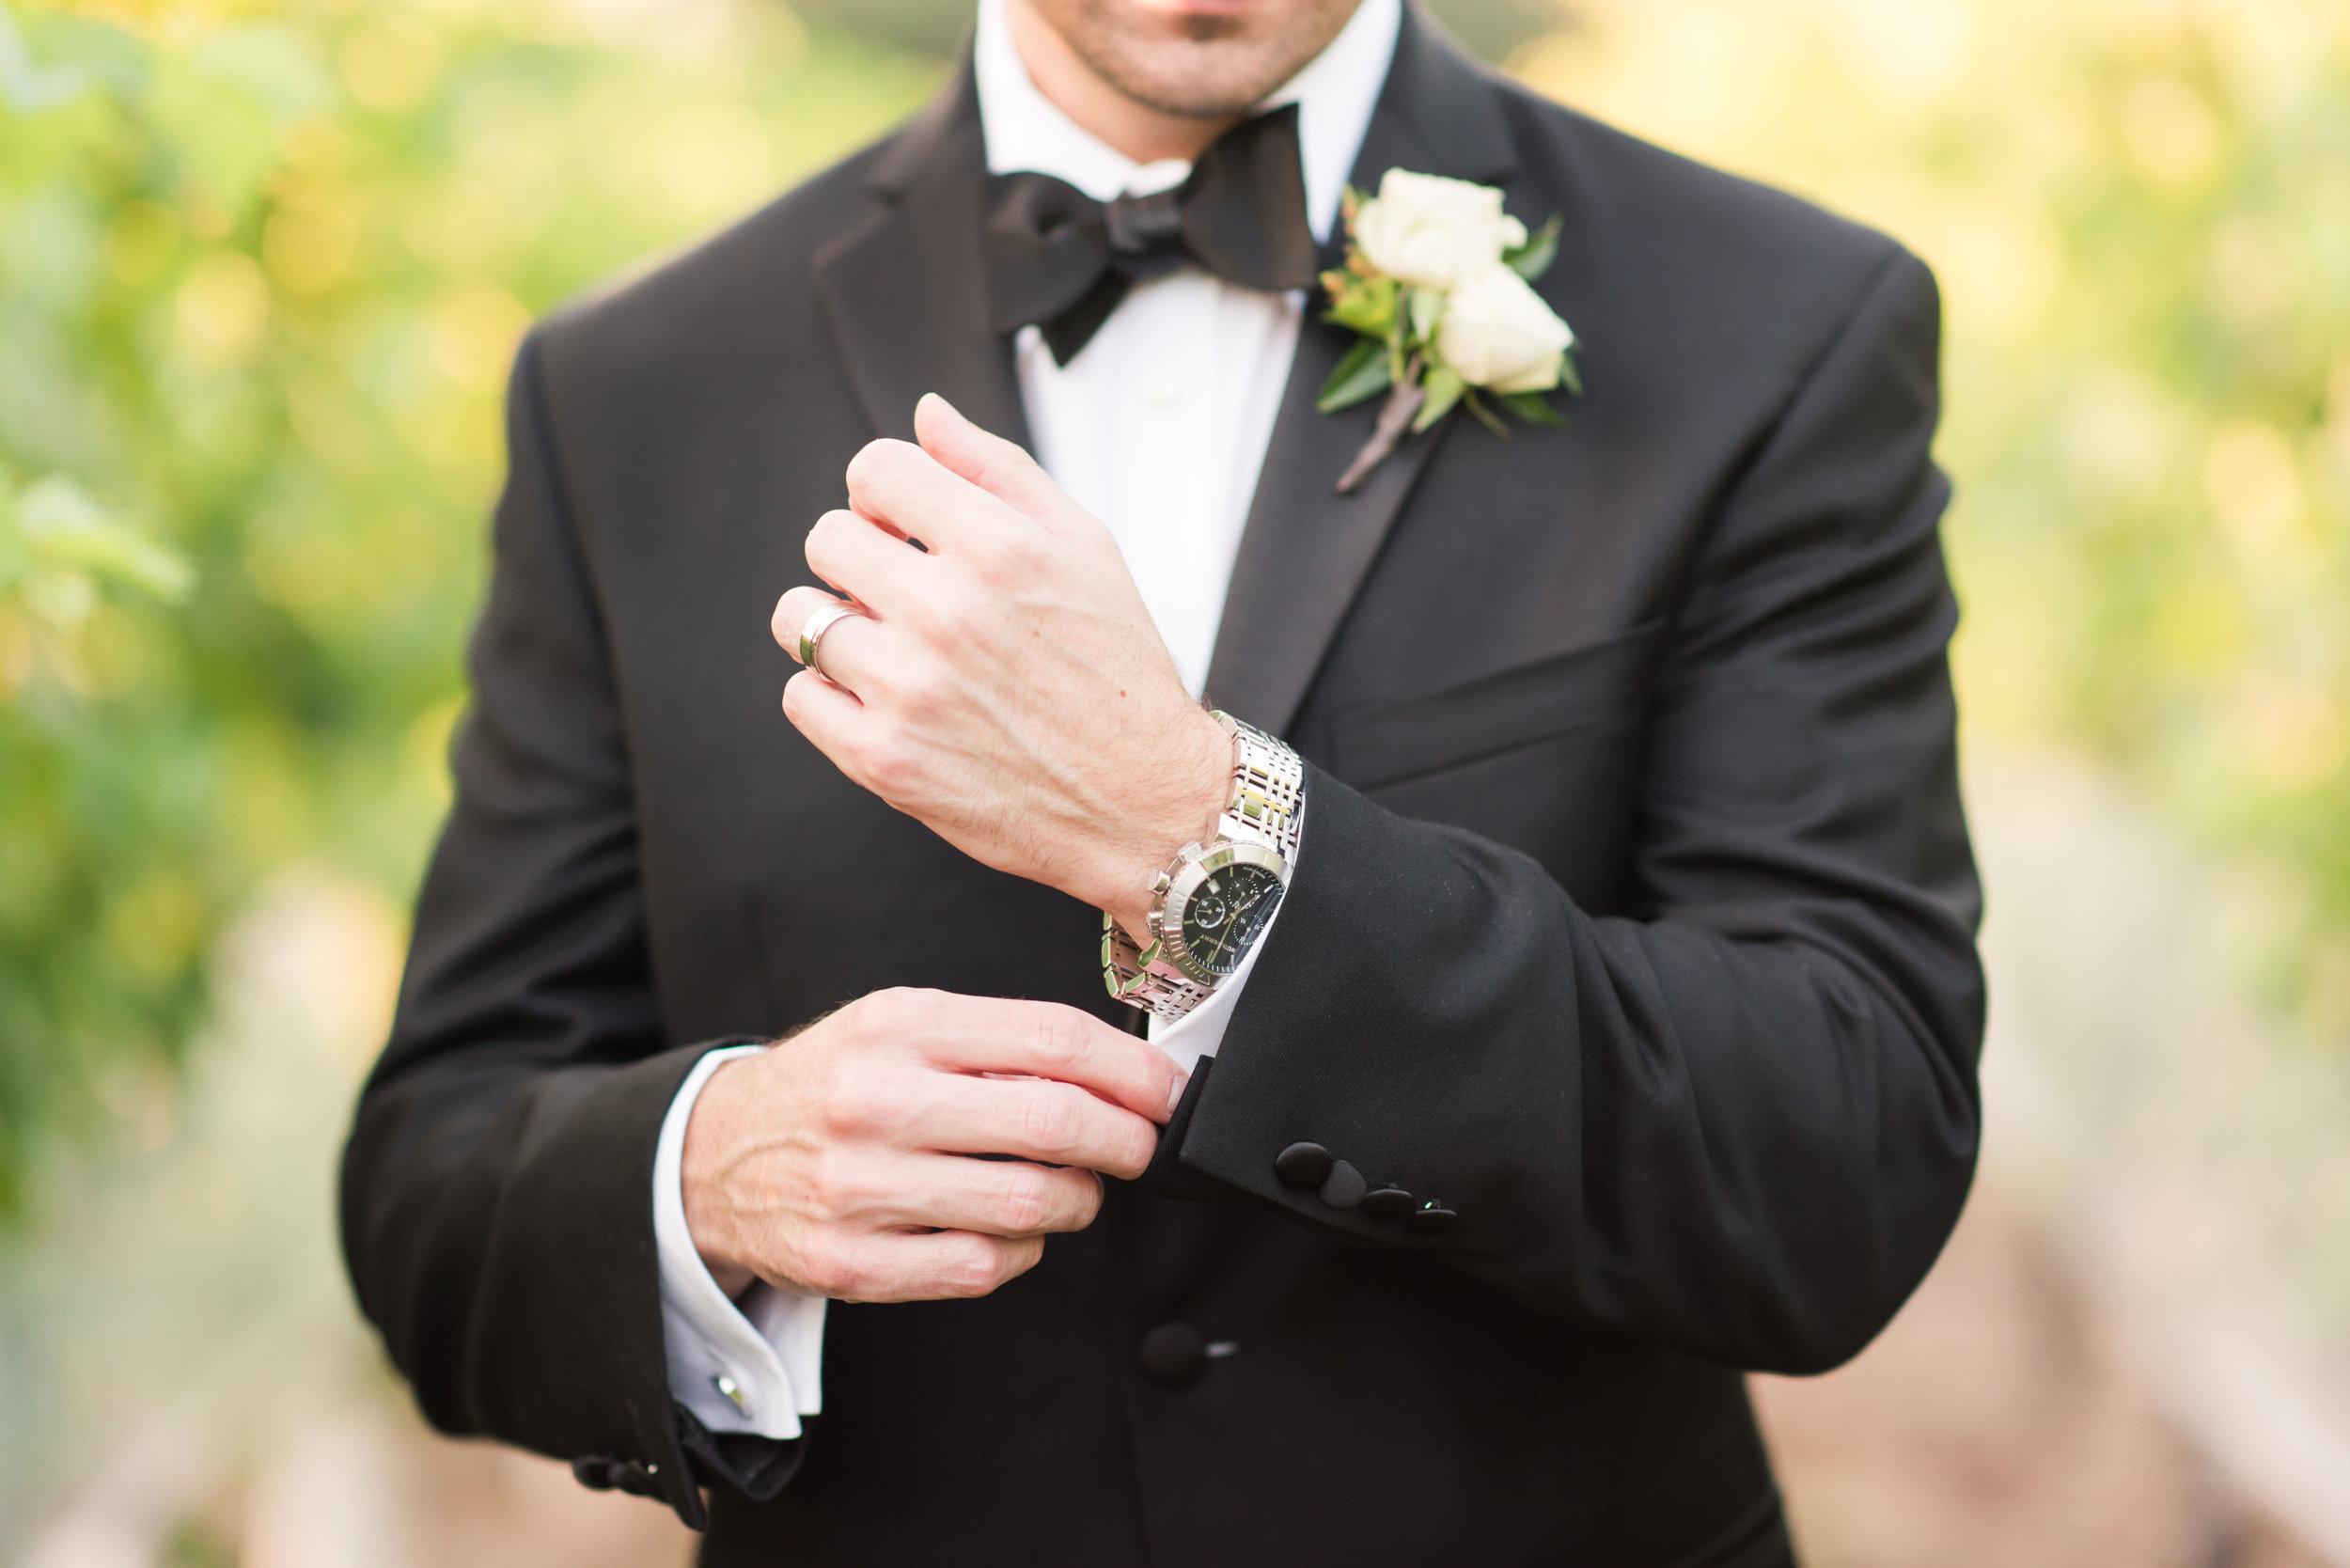 MORAIS VINEYARDS WEDDING A BEYOUTIFUL FETE EVENTS & DESIGN  - VIRGINIA AND DC WEDDING PLANNER 16.jpg